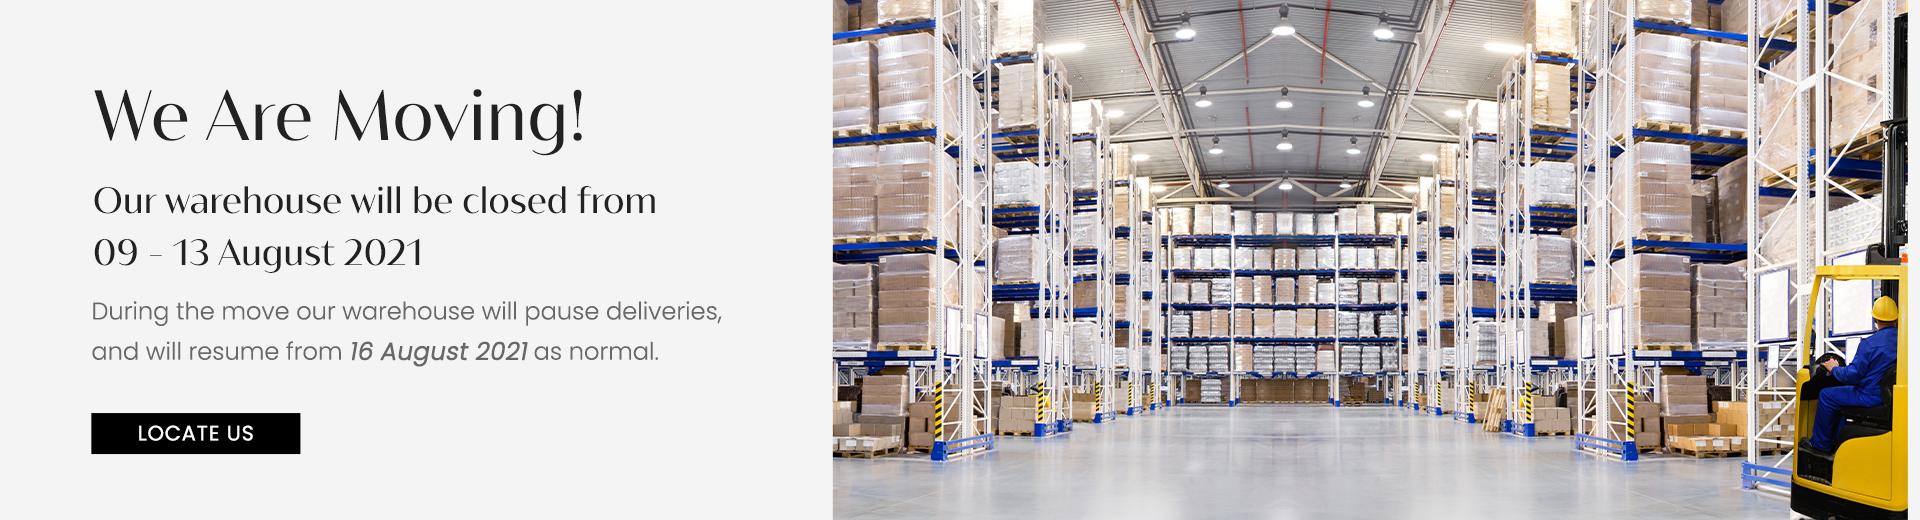 Temporary-warehouse-closure